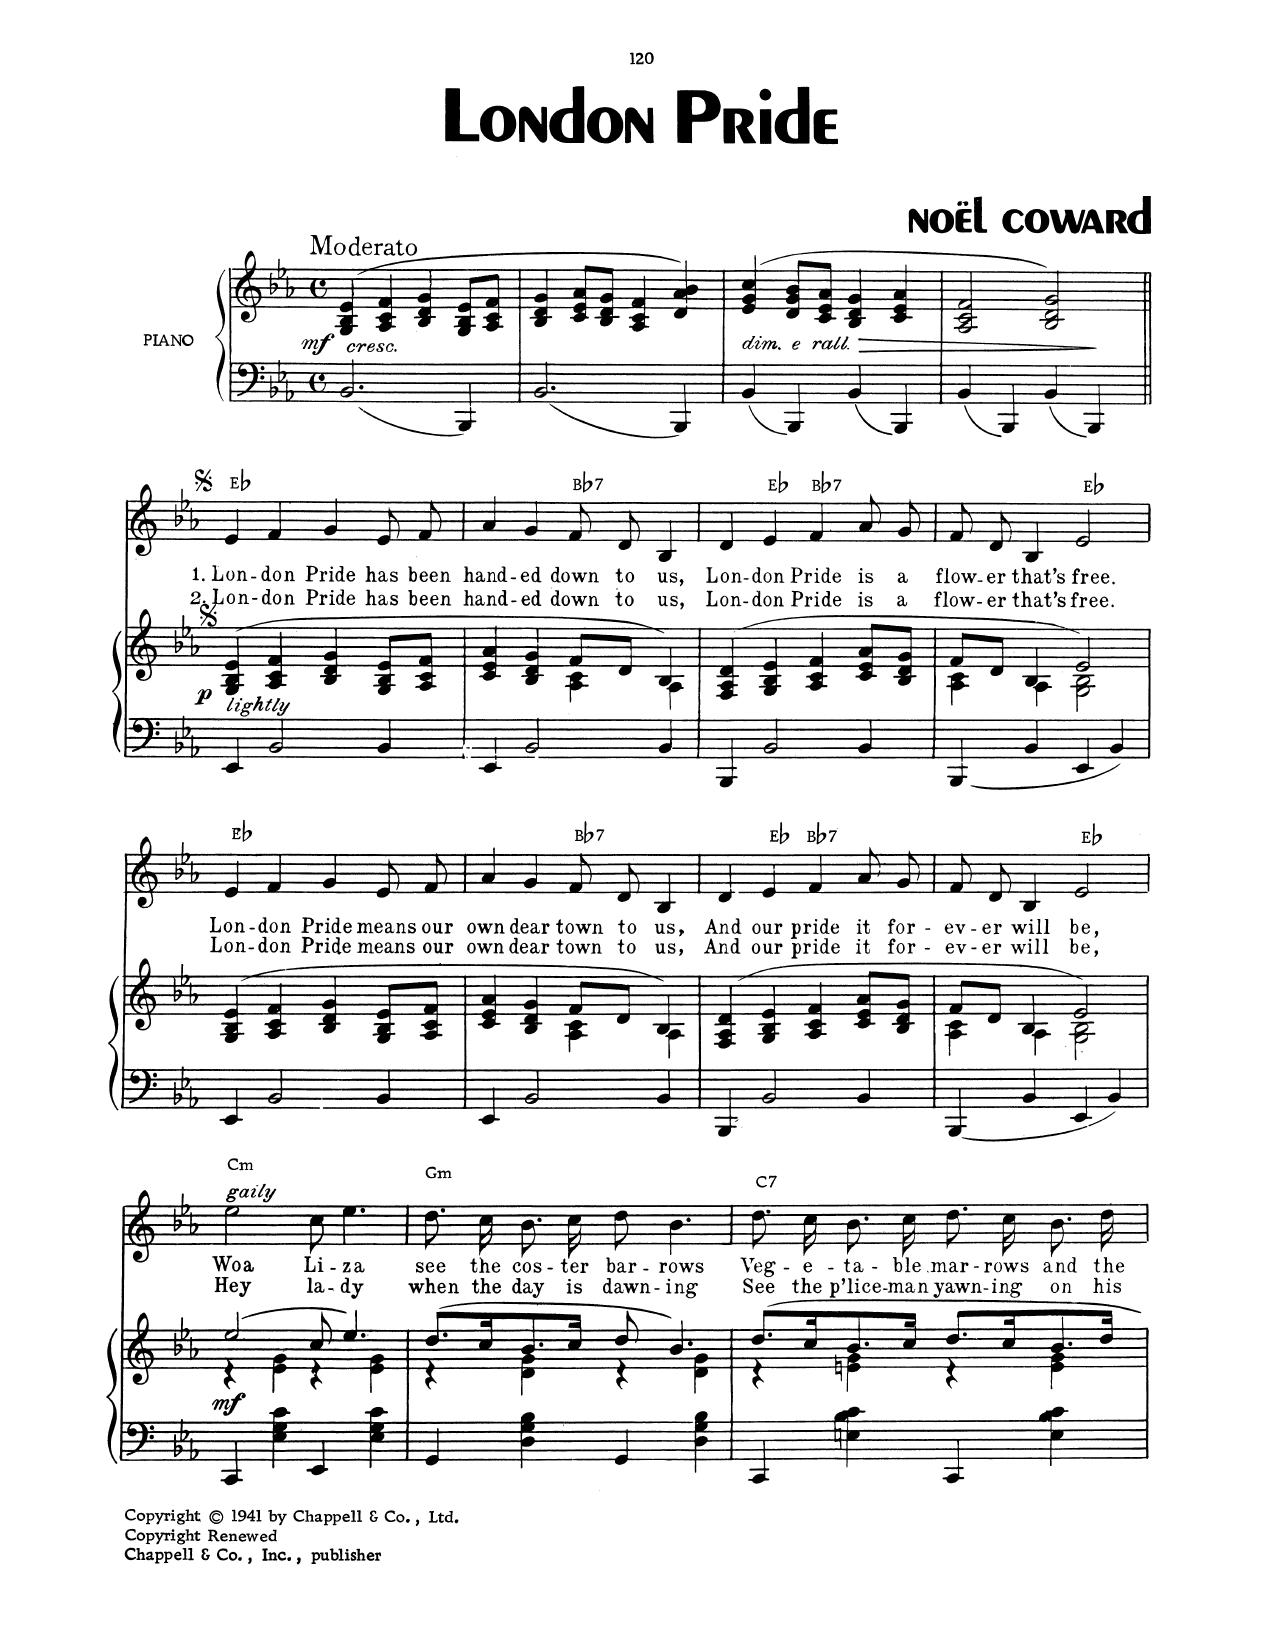 Noel Coward London Pride sheet music notes and chords